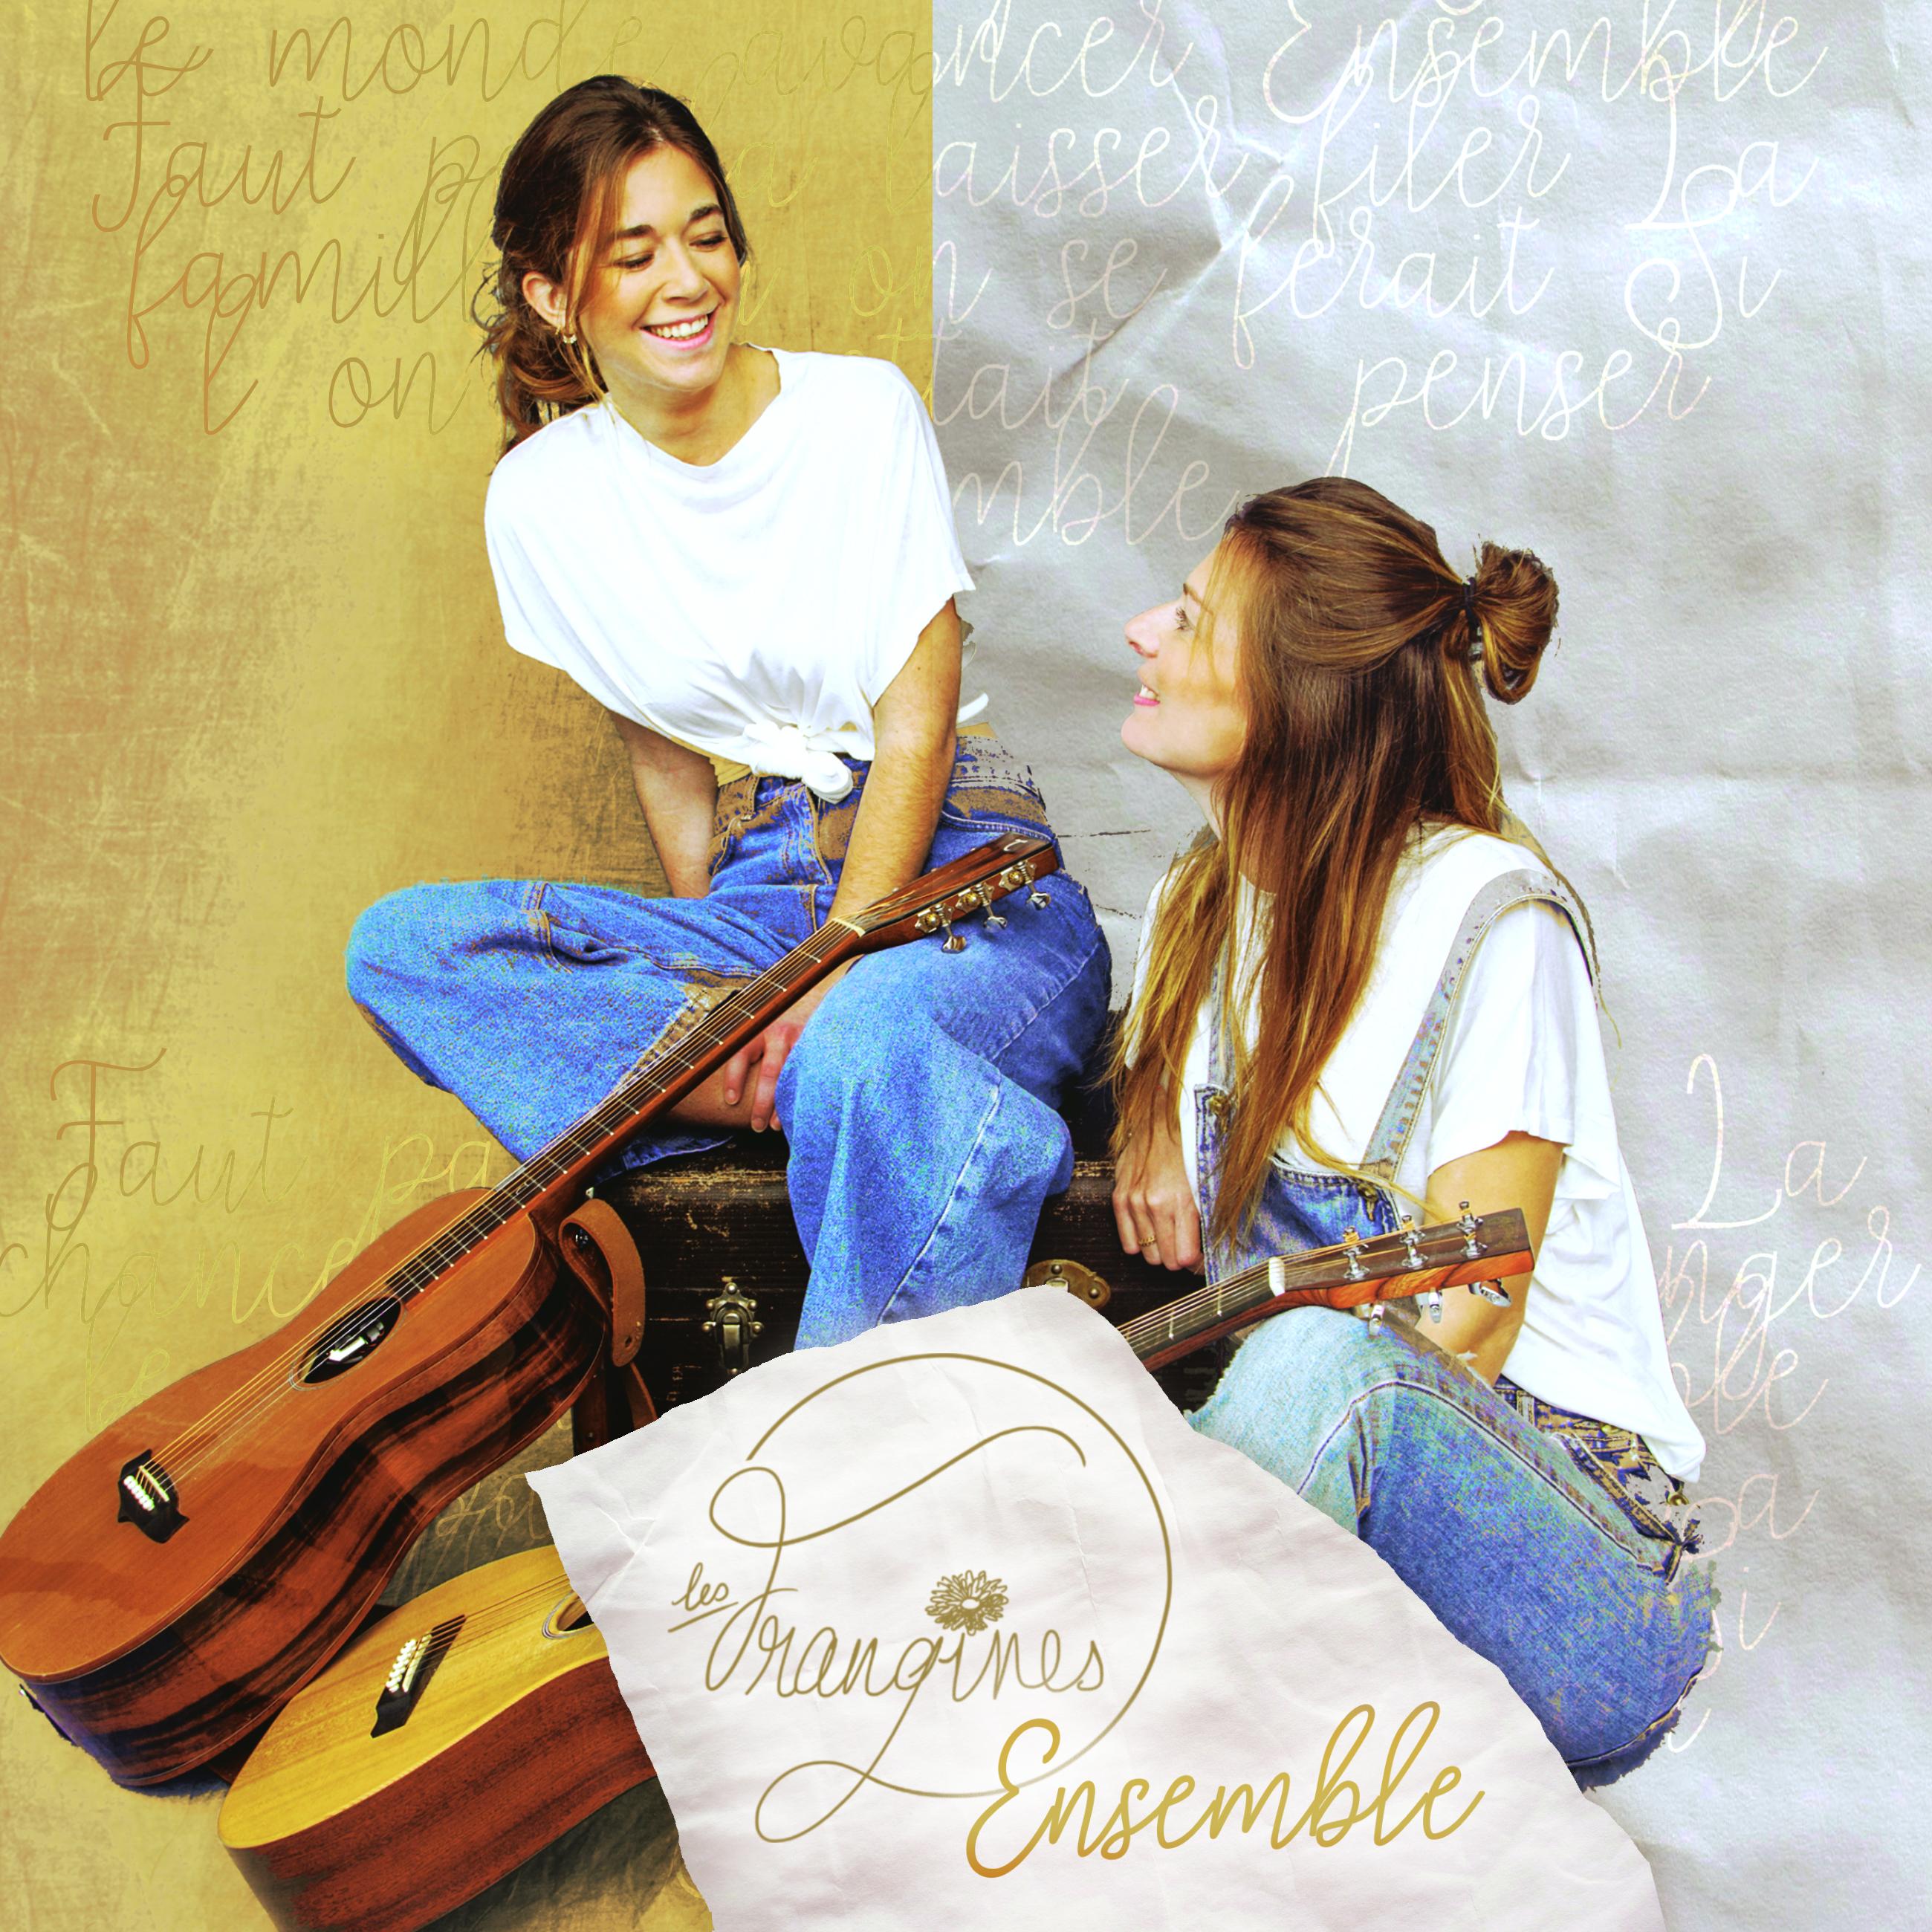 Les Frangines - Ensemble